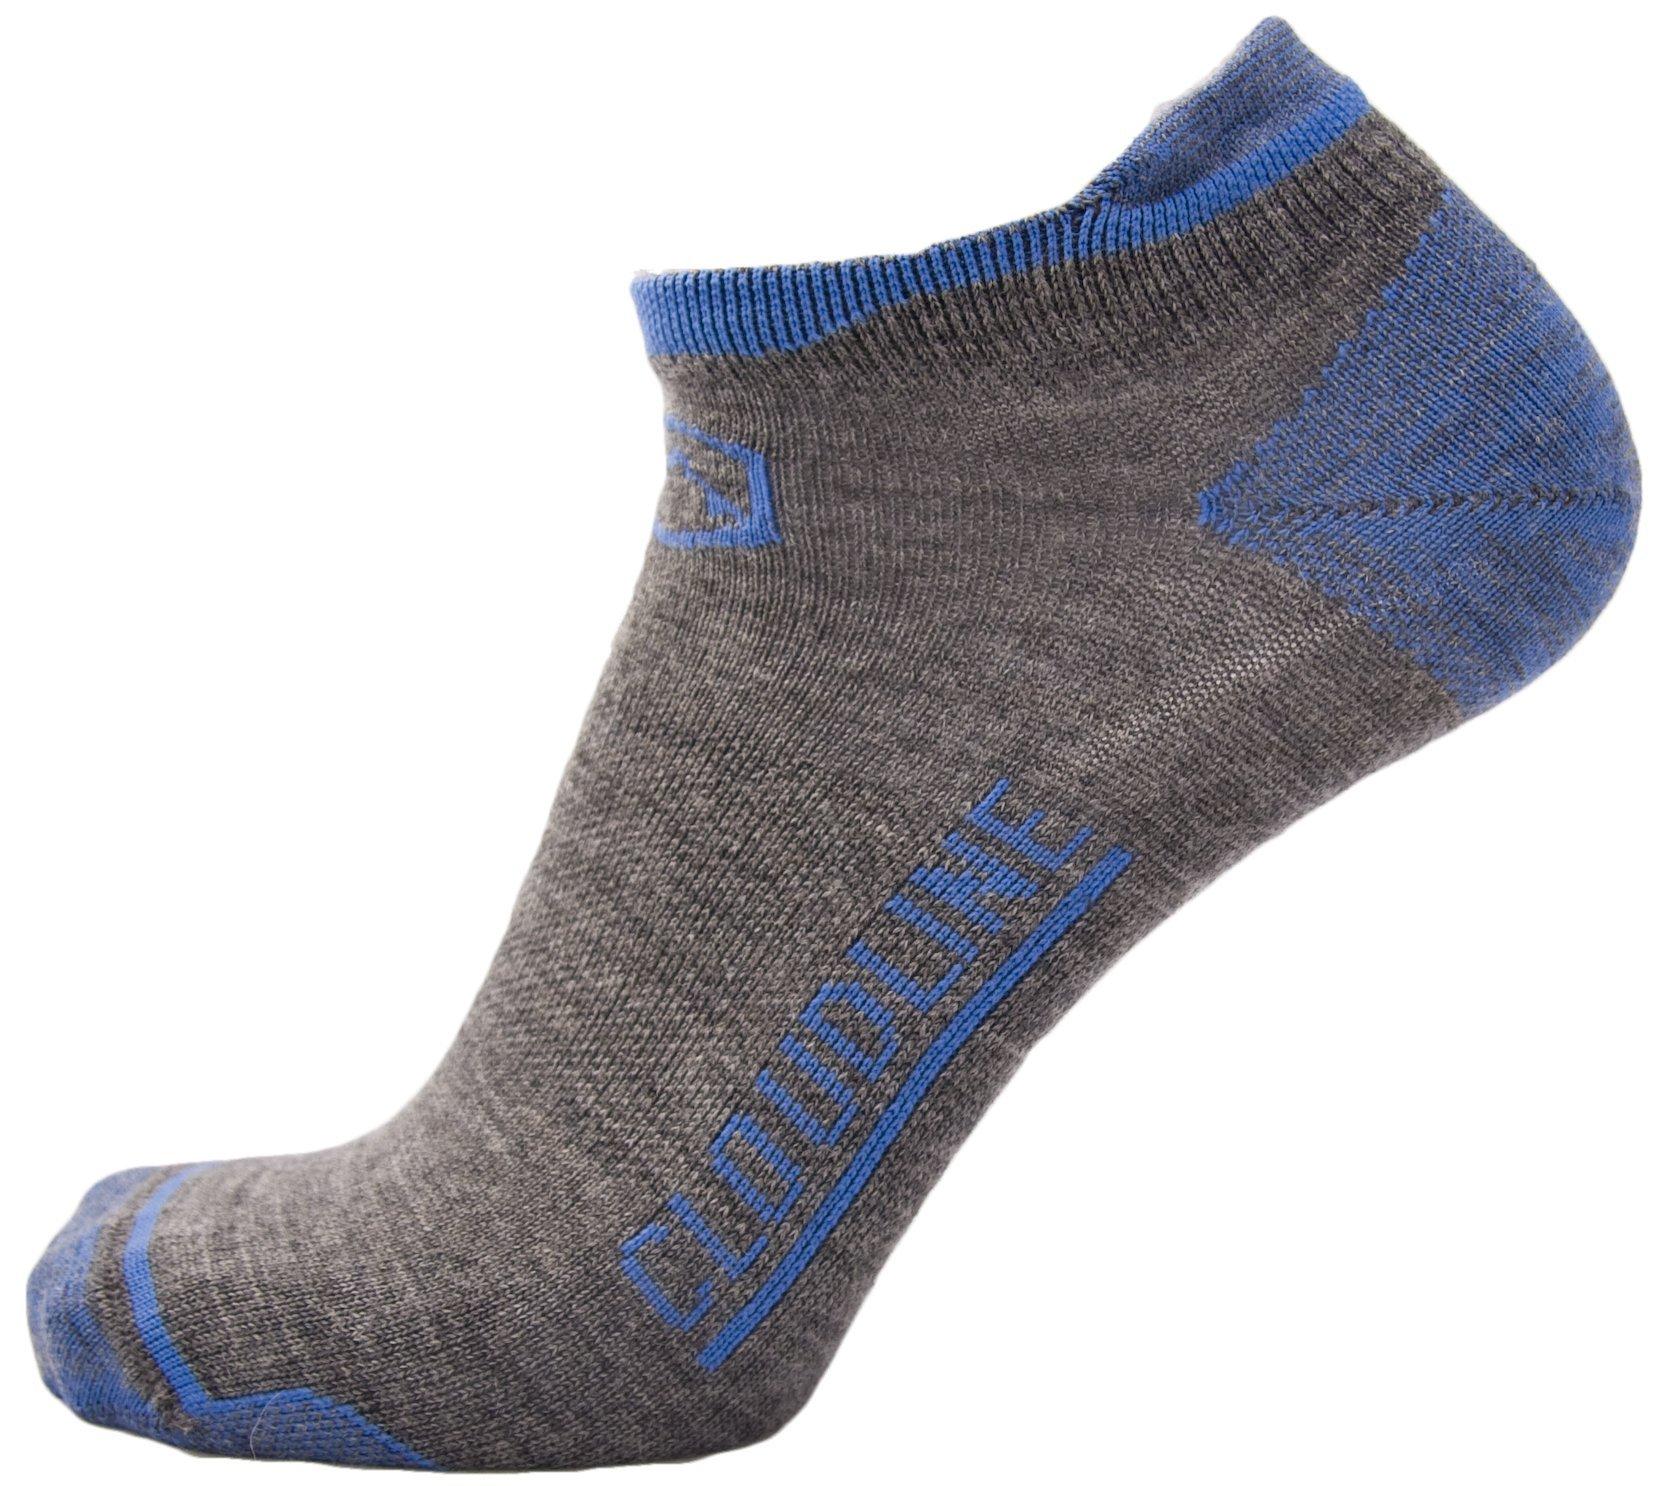 CloudLine Merino Wool No Show Athletic Tab Ankle Running Socks - Ultra Light - Medium Glacial Blue - for Men & Women